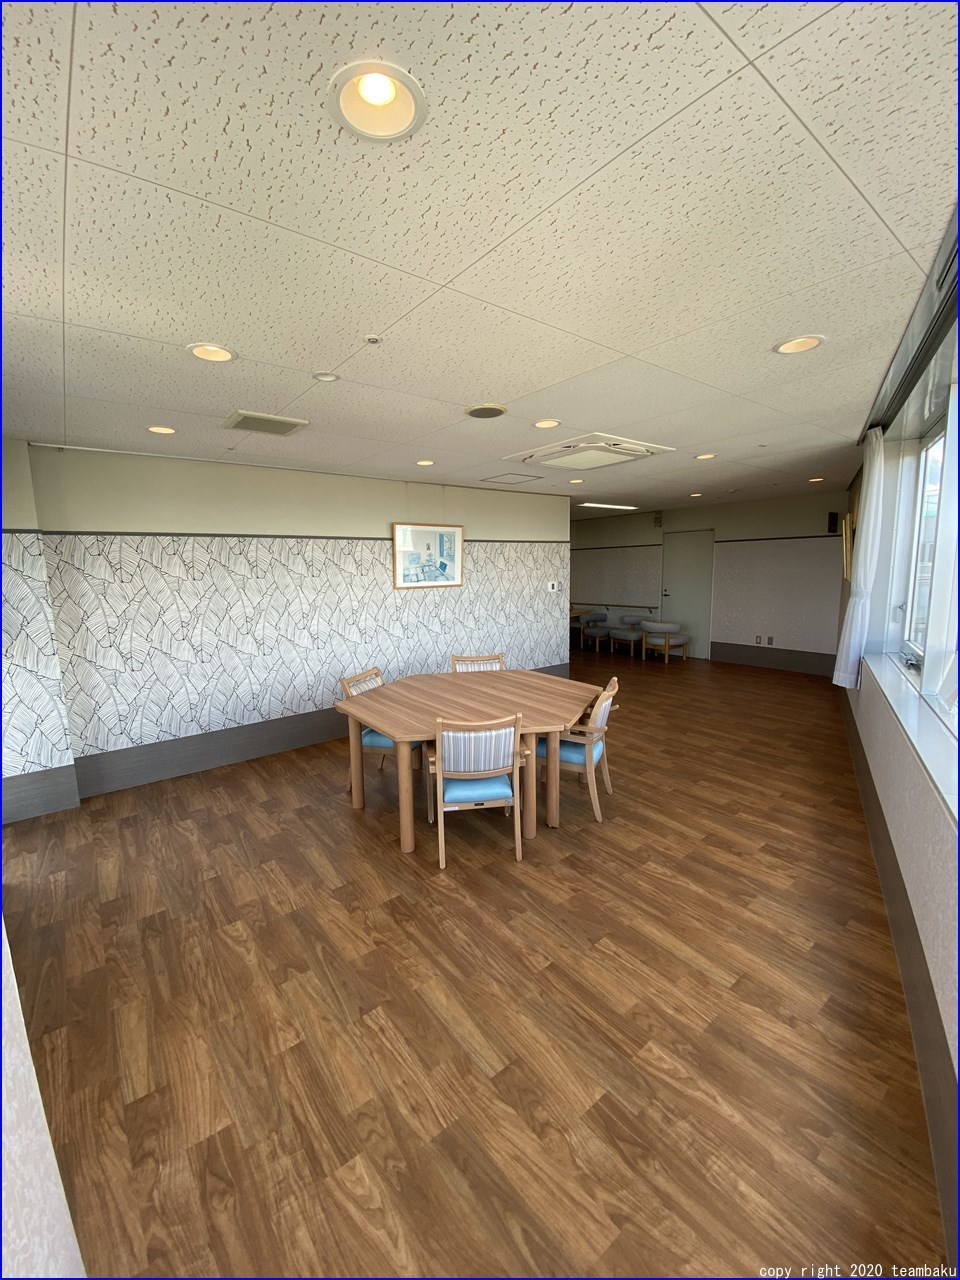 N病院グループ N病院東館 介護医療院 転換改修工事 4_c0376508_12014583.jpg